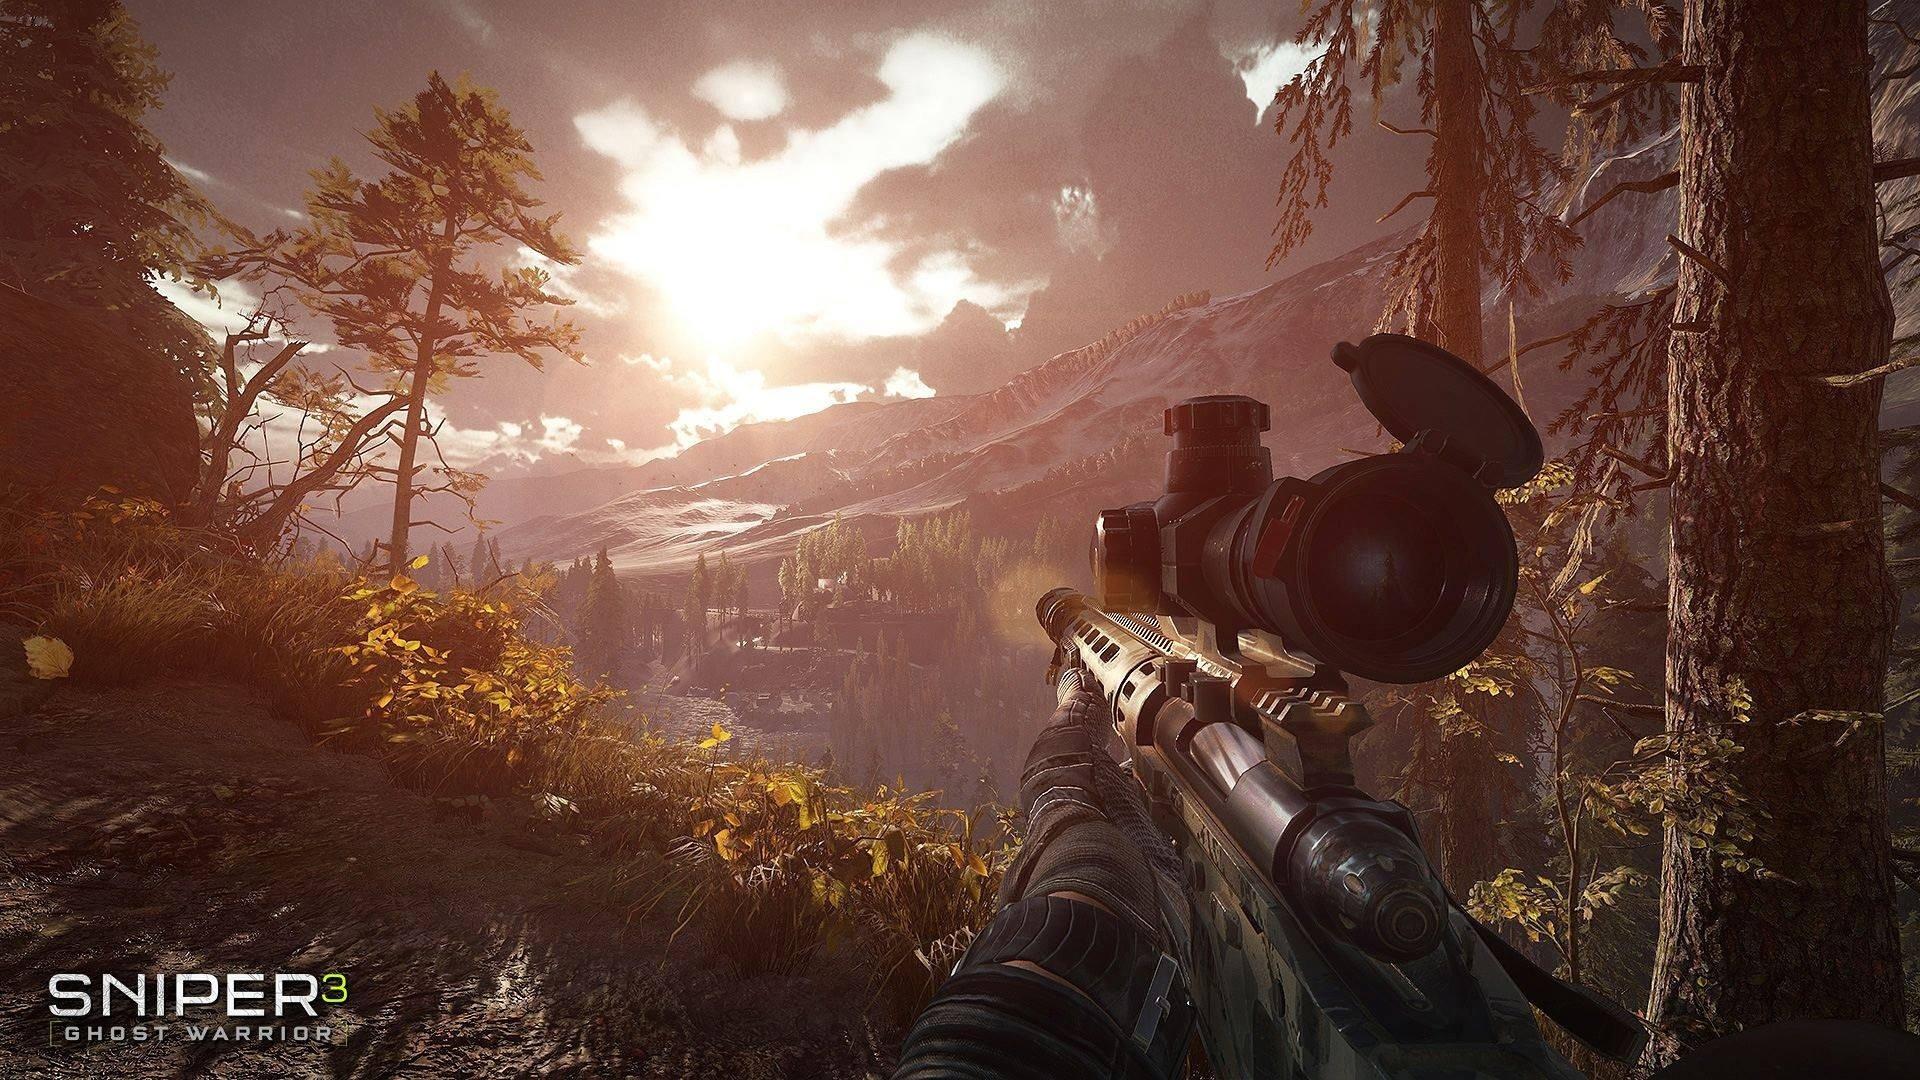 Gamescom 2016  تماشا کنید: اتمام یکی از مراحل Sniper Ghost Warrior 3 به سه روش متفاوت